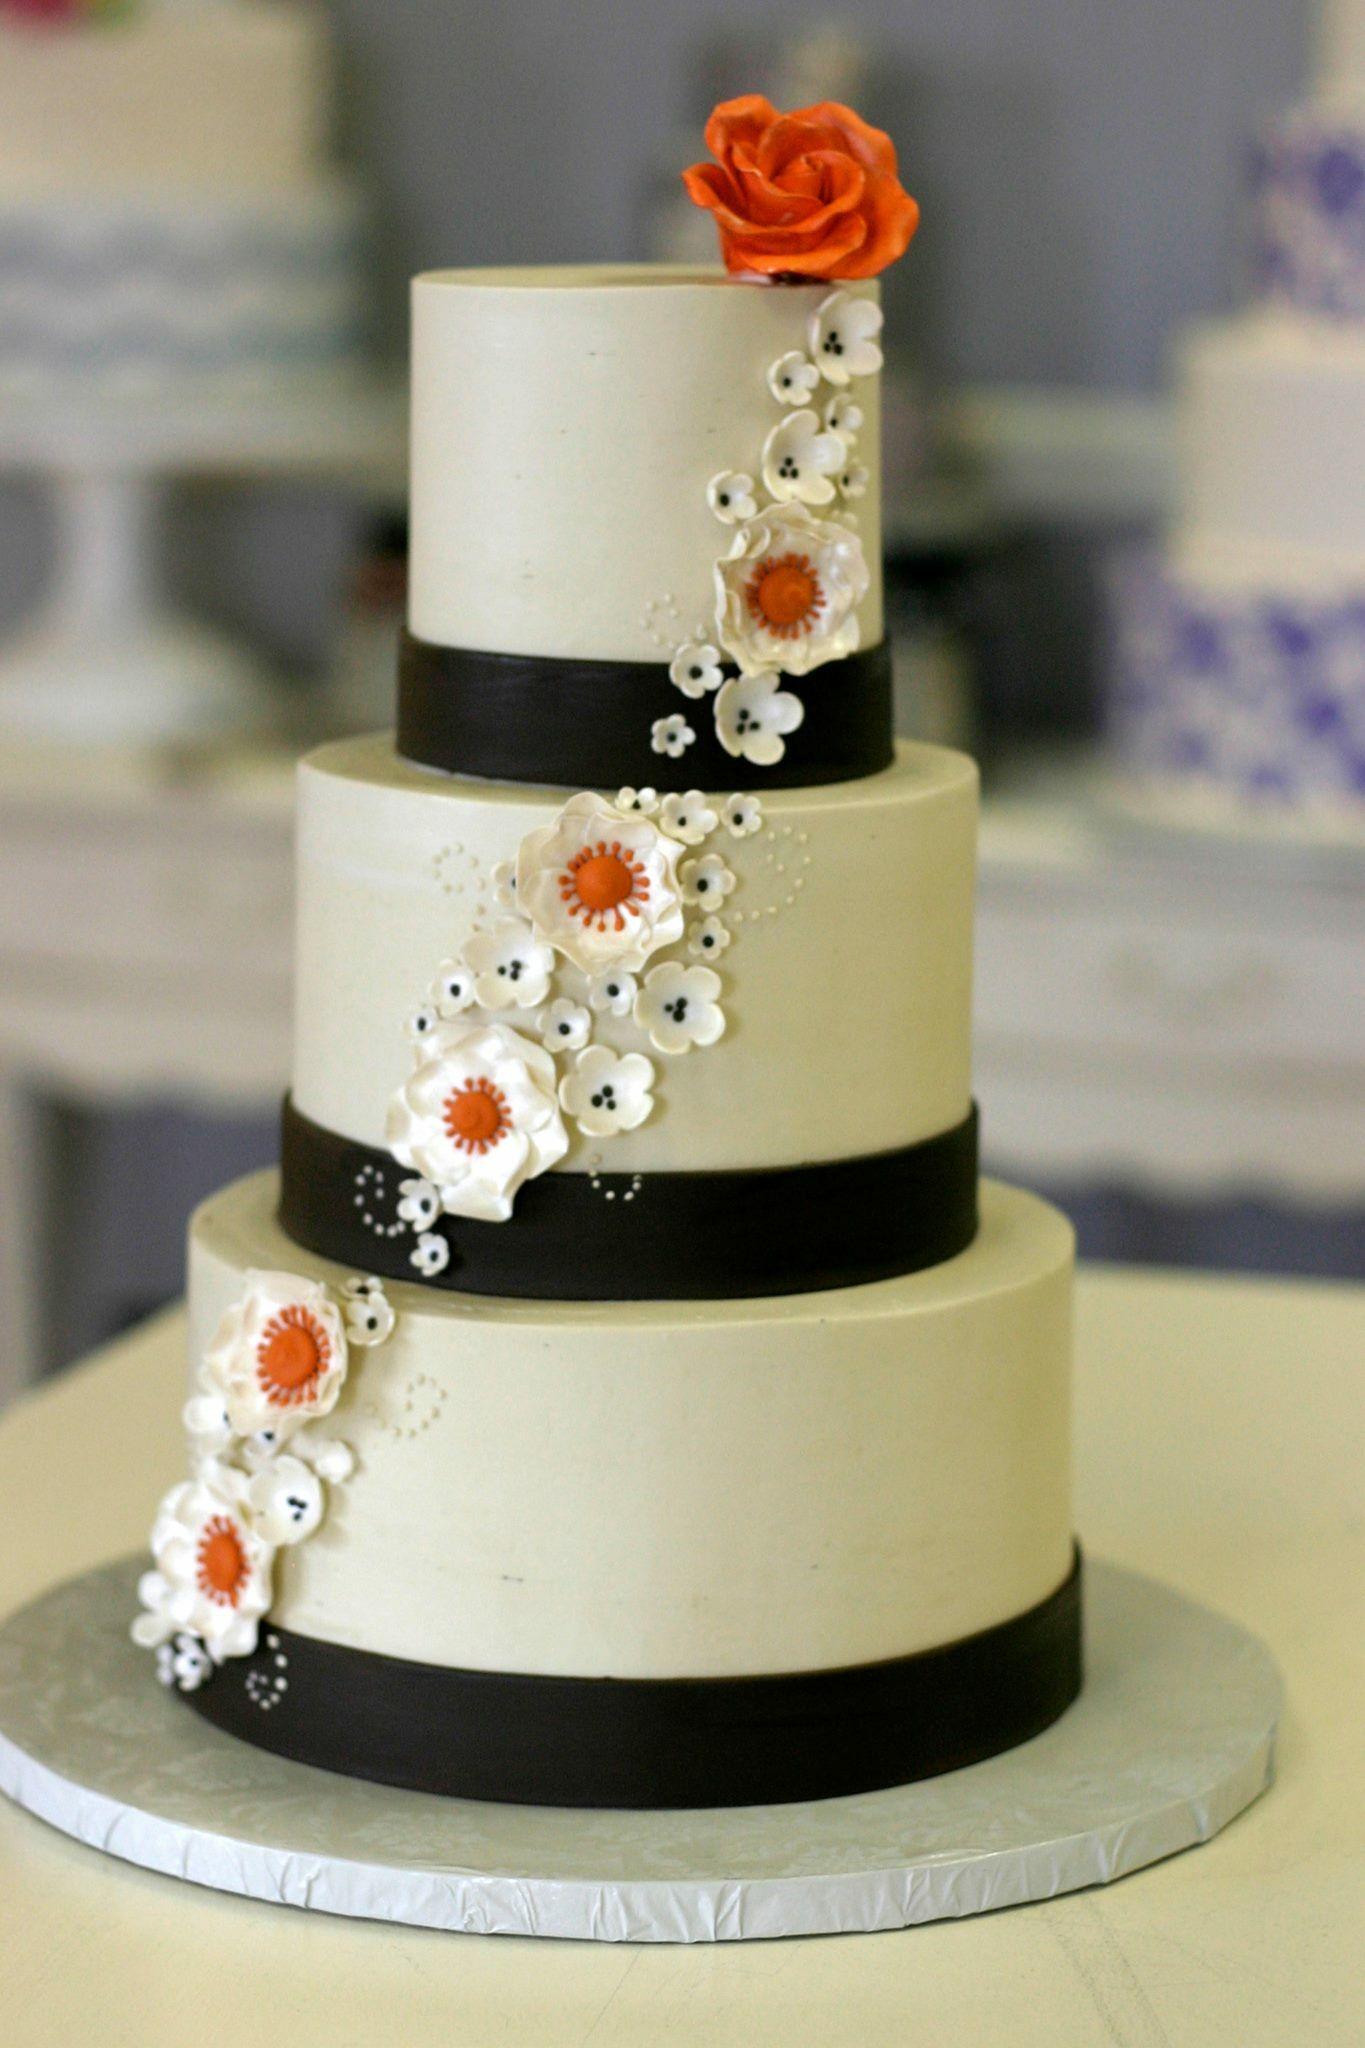 Sarah S Cake Shop Wedding Cakes Chesterfield Mo